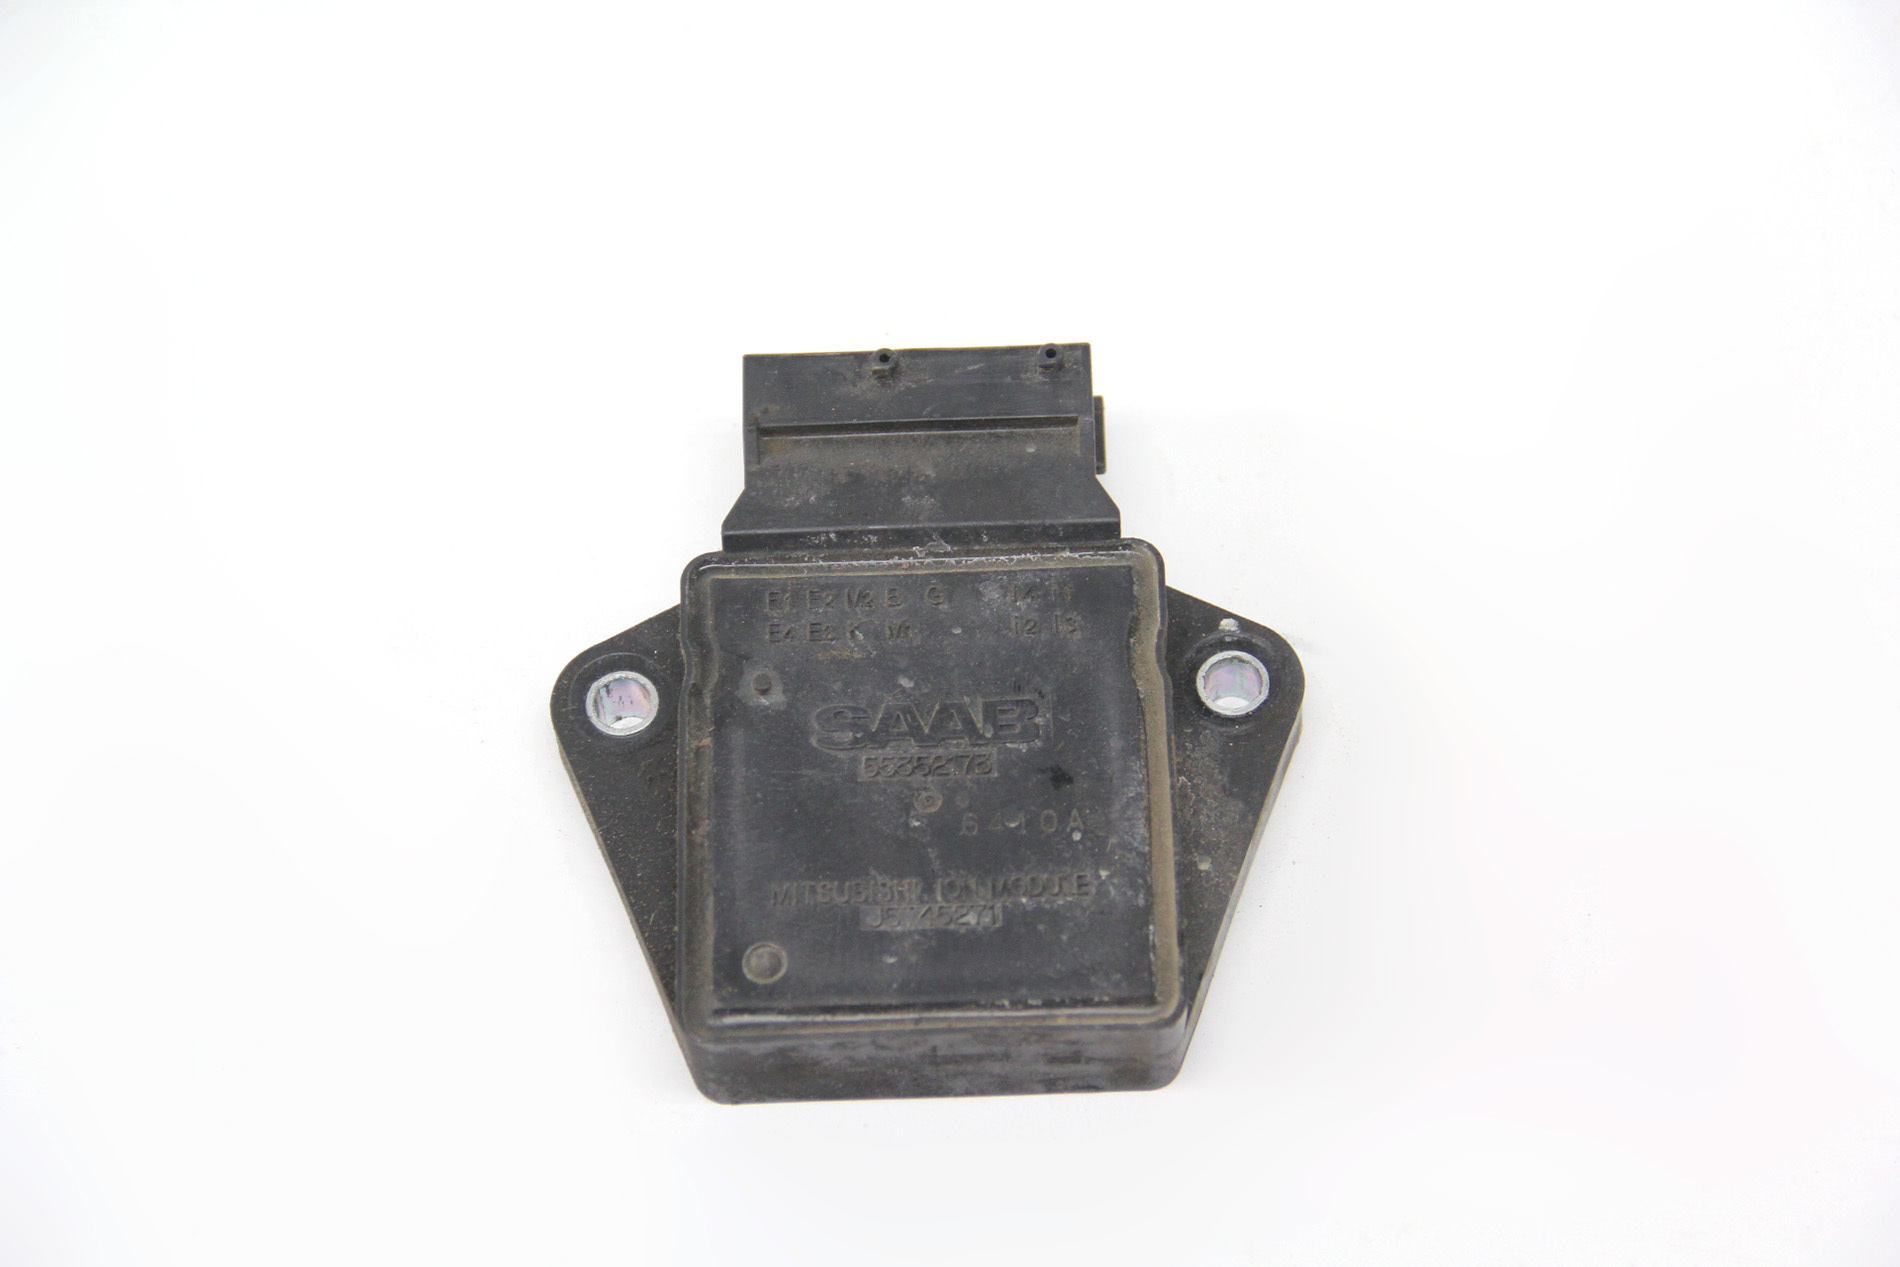 Saab 9-3 03-11 Turbo Ignition Ignitor Ion Unit 2.0L Turbo 4 Cyl 55352173, OEM